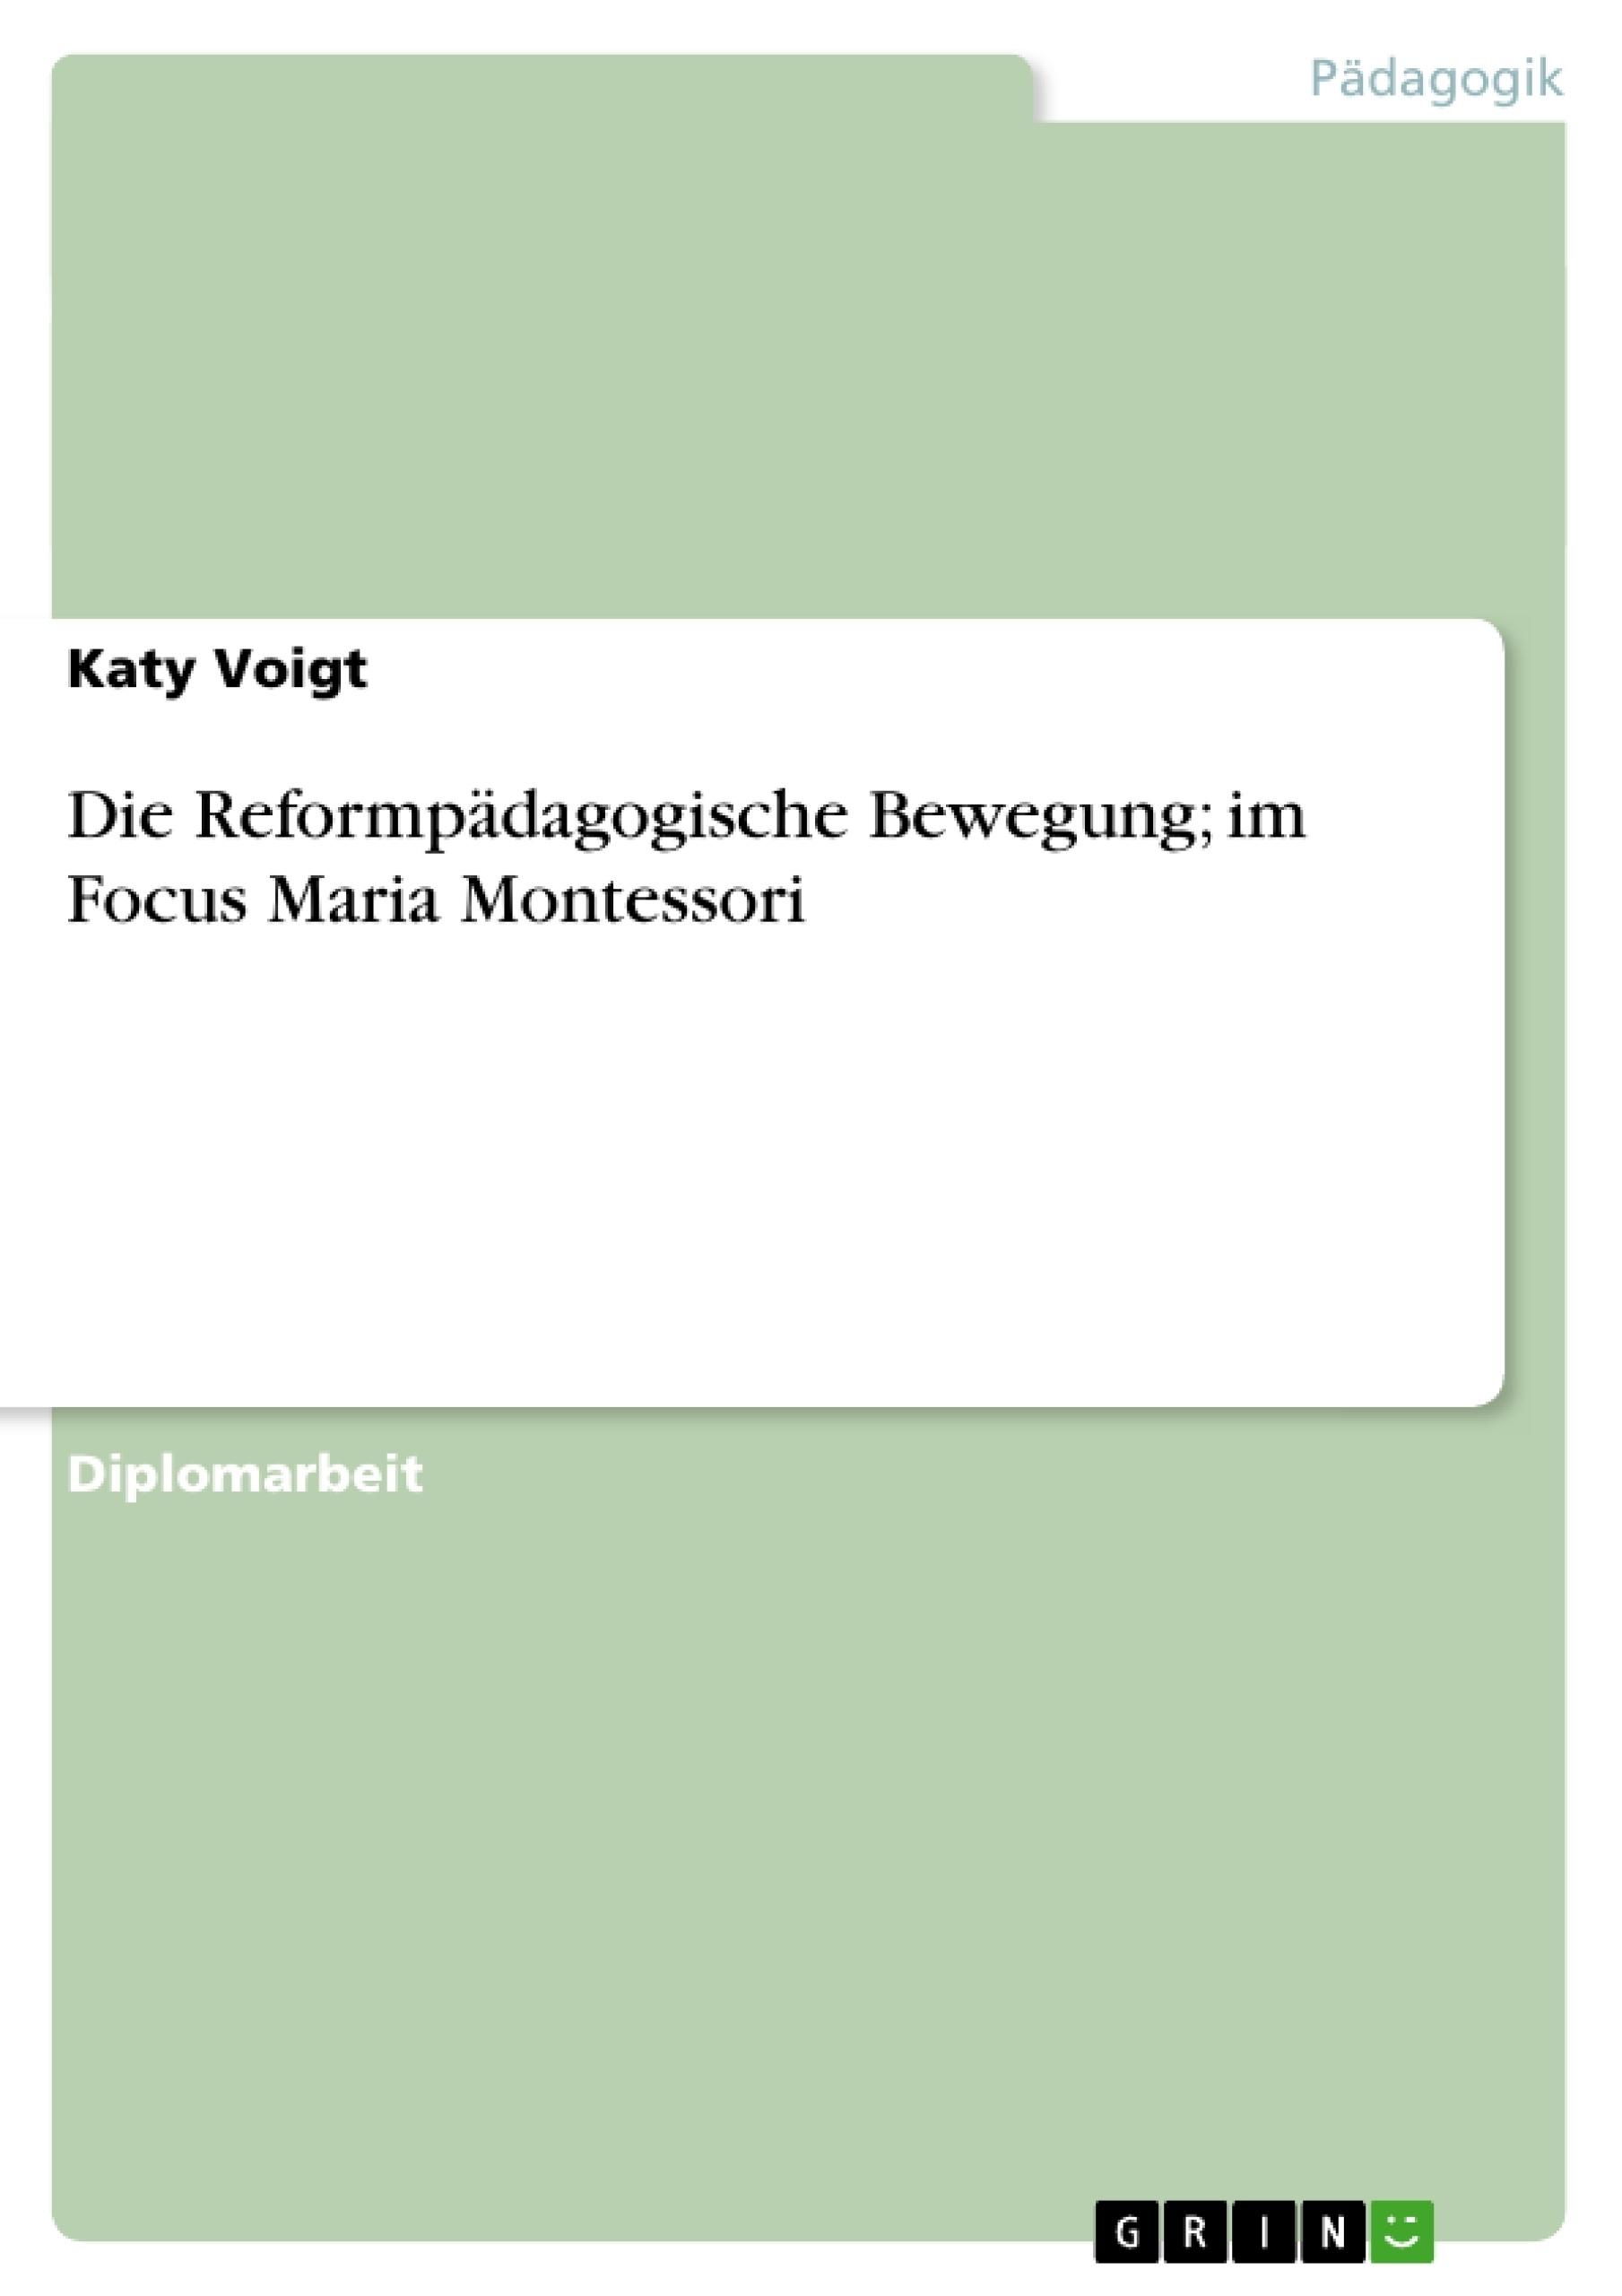 Die Reformpädagogische Bewegung; im Focus Maria Montessori ...